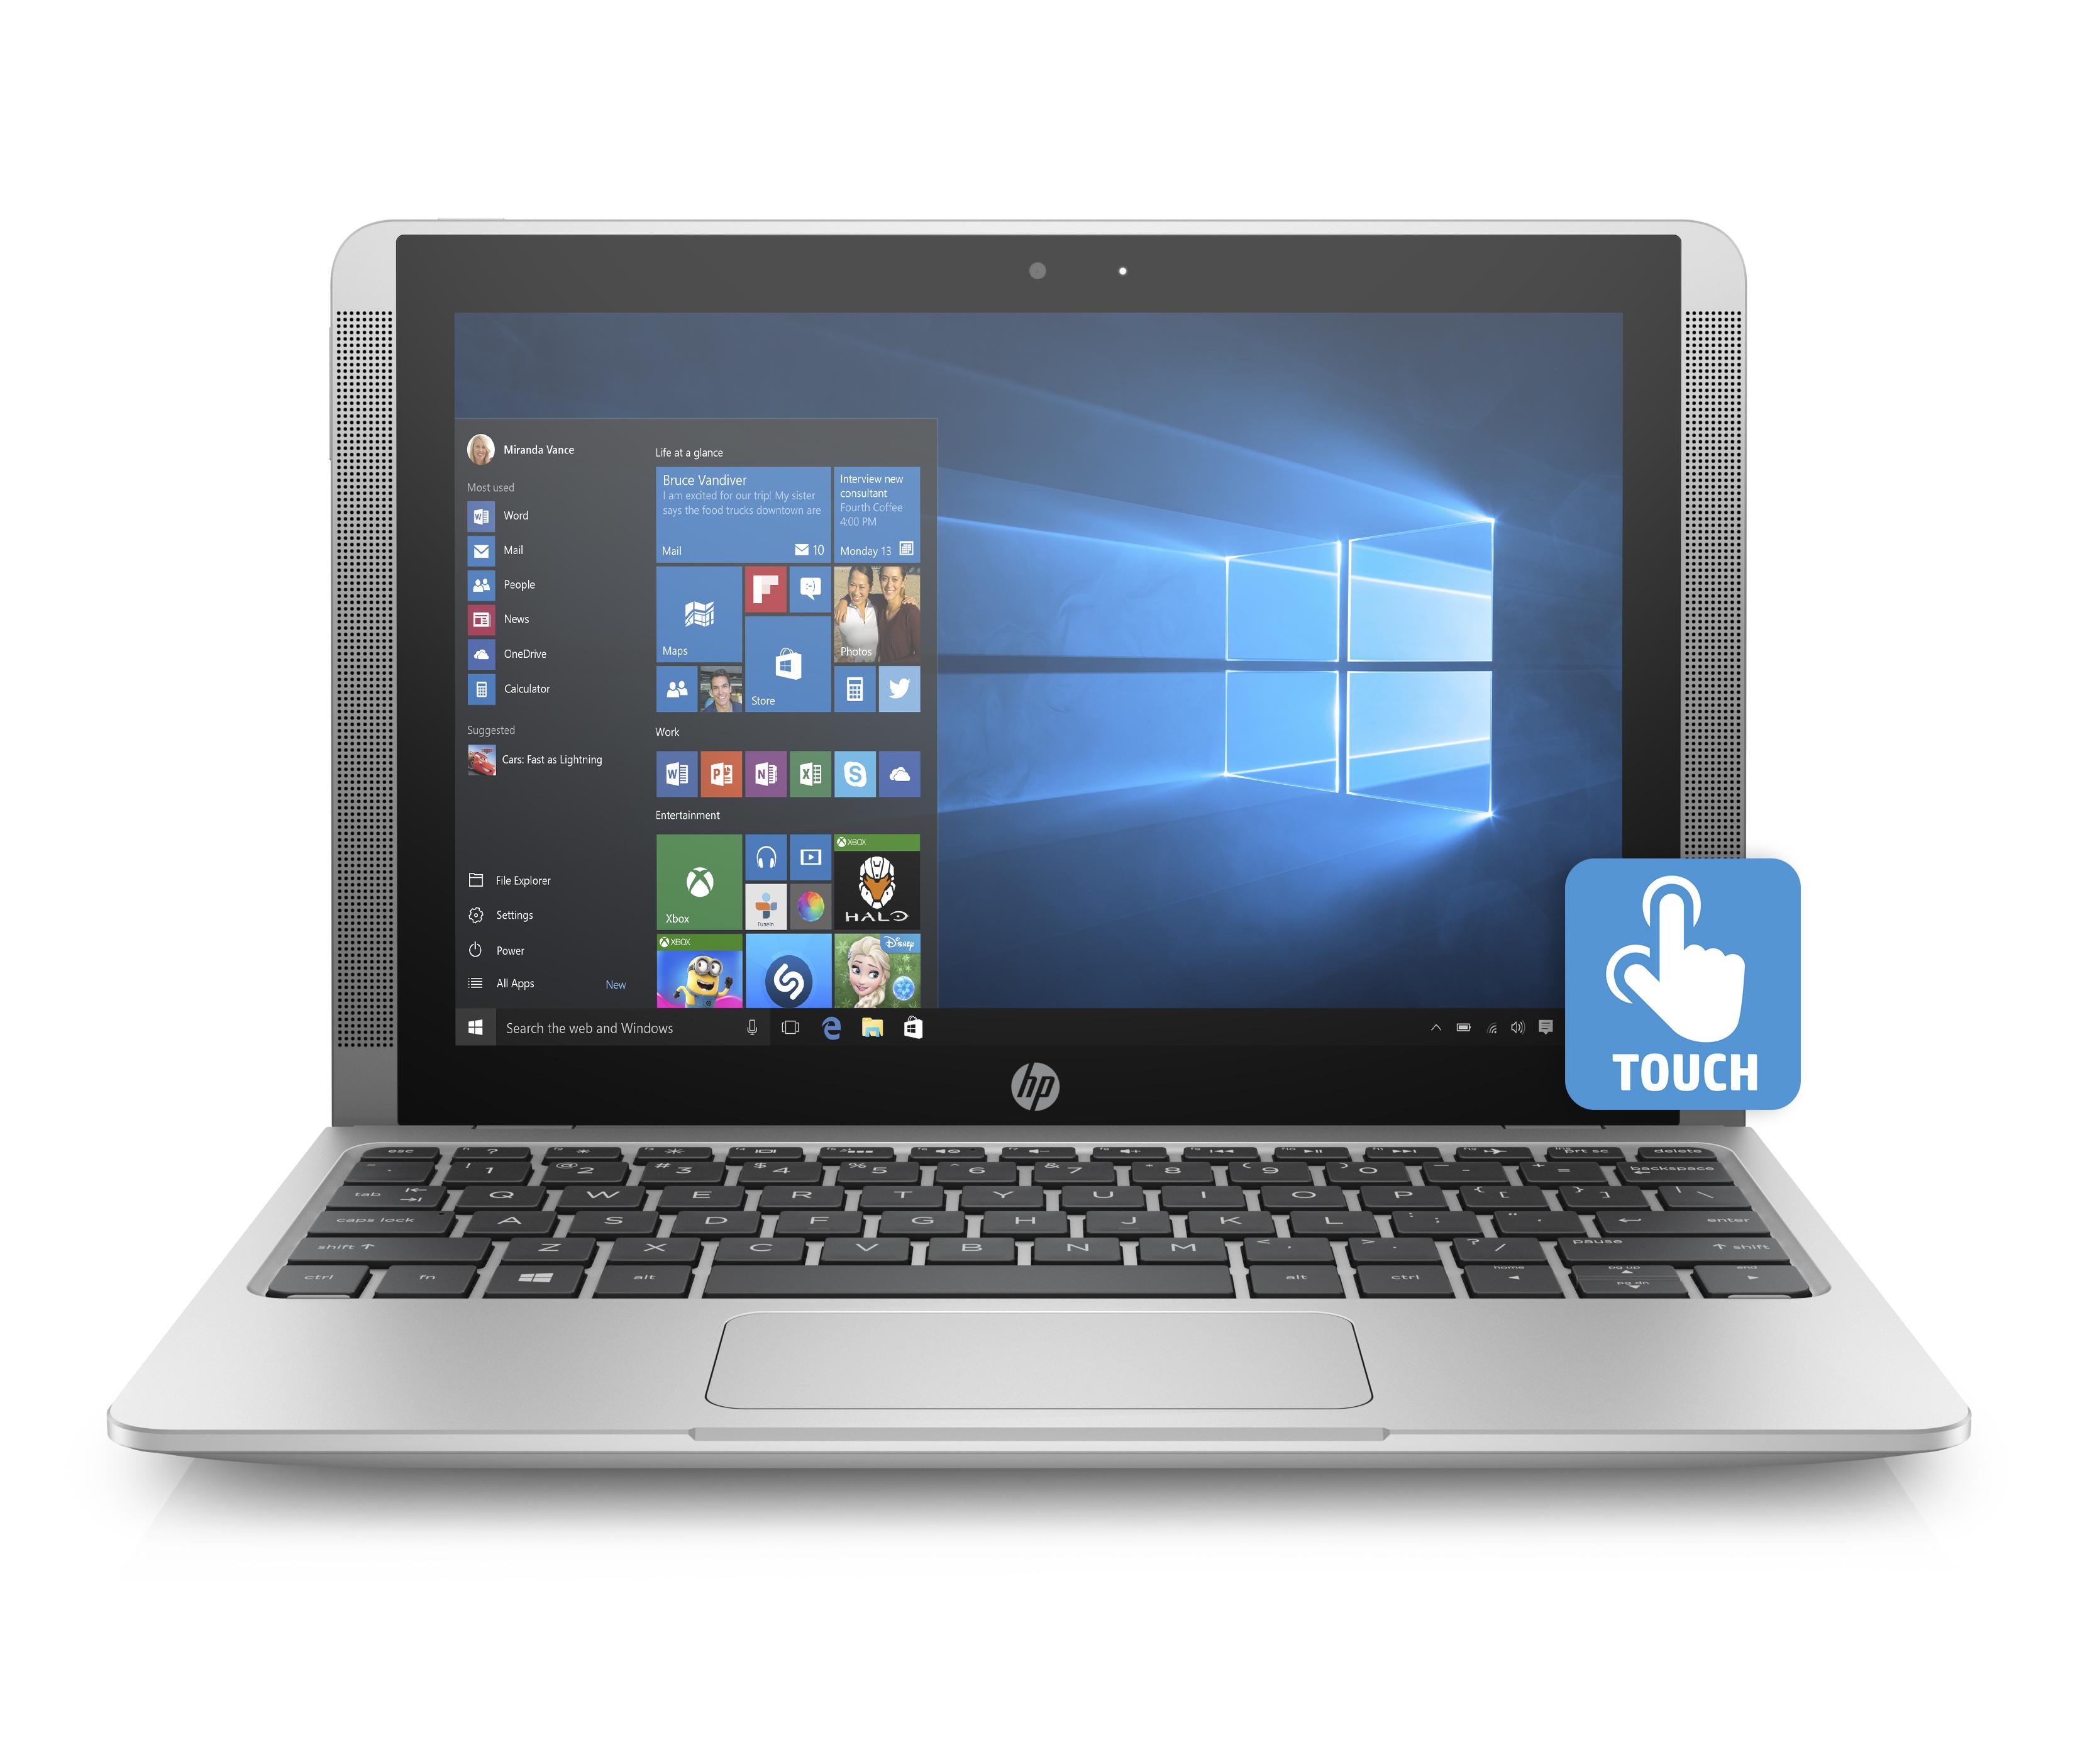 "HP x2 Detachable Laptop, 10.1"" IPS Touch, Win10 Home, Atom x5-Z8350, 4GB Memory, 64GB eMMC, Active Pen, $199 Walmart YMMV"